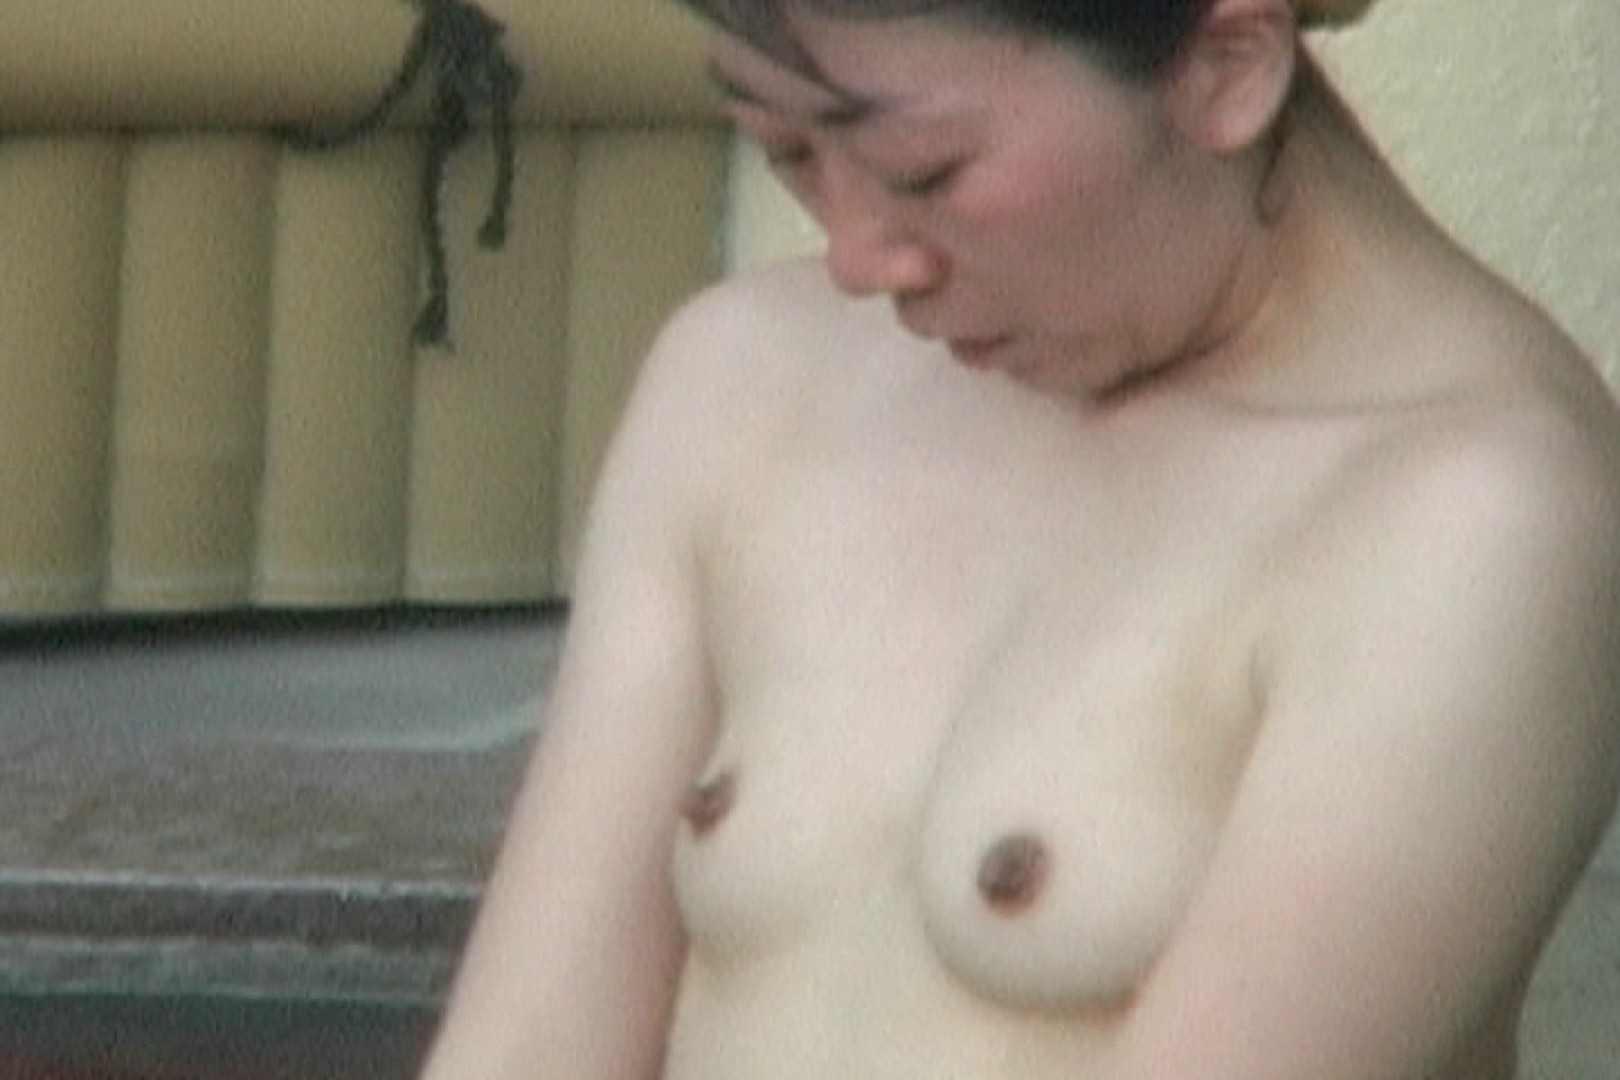 Aquaな露天風呂Vol.594 0   0  90連発 15